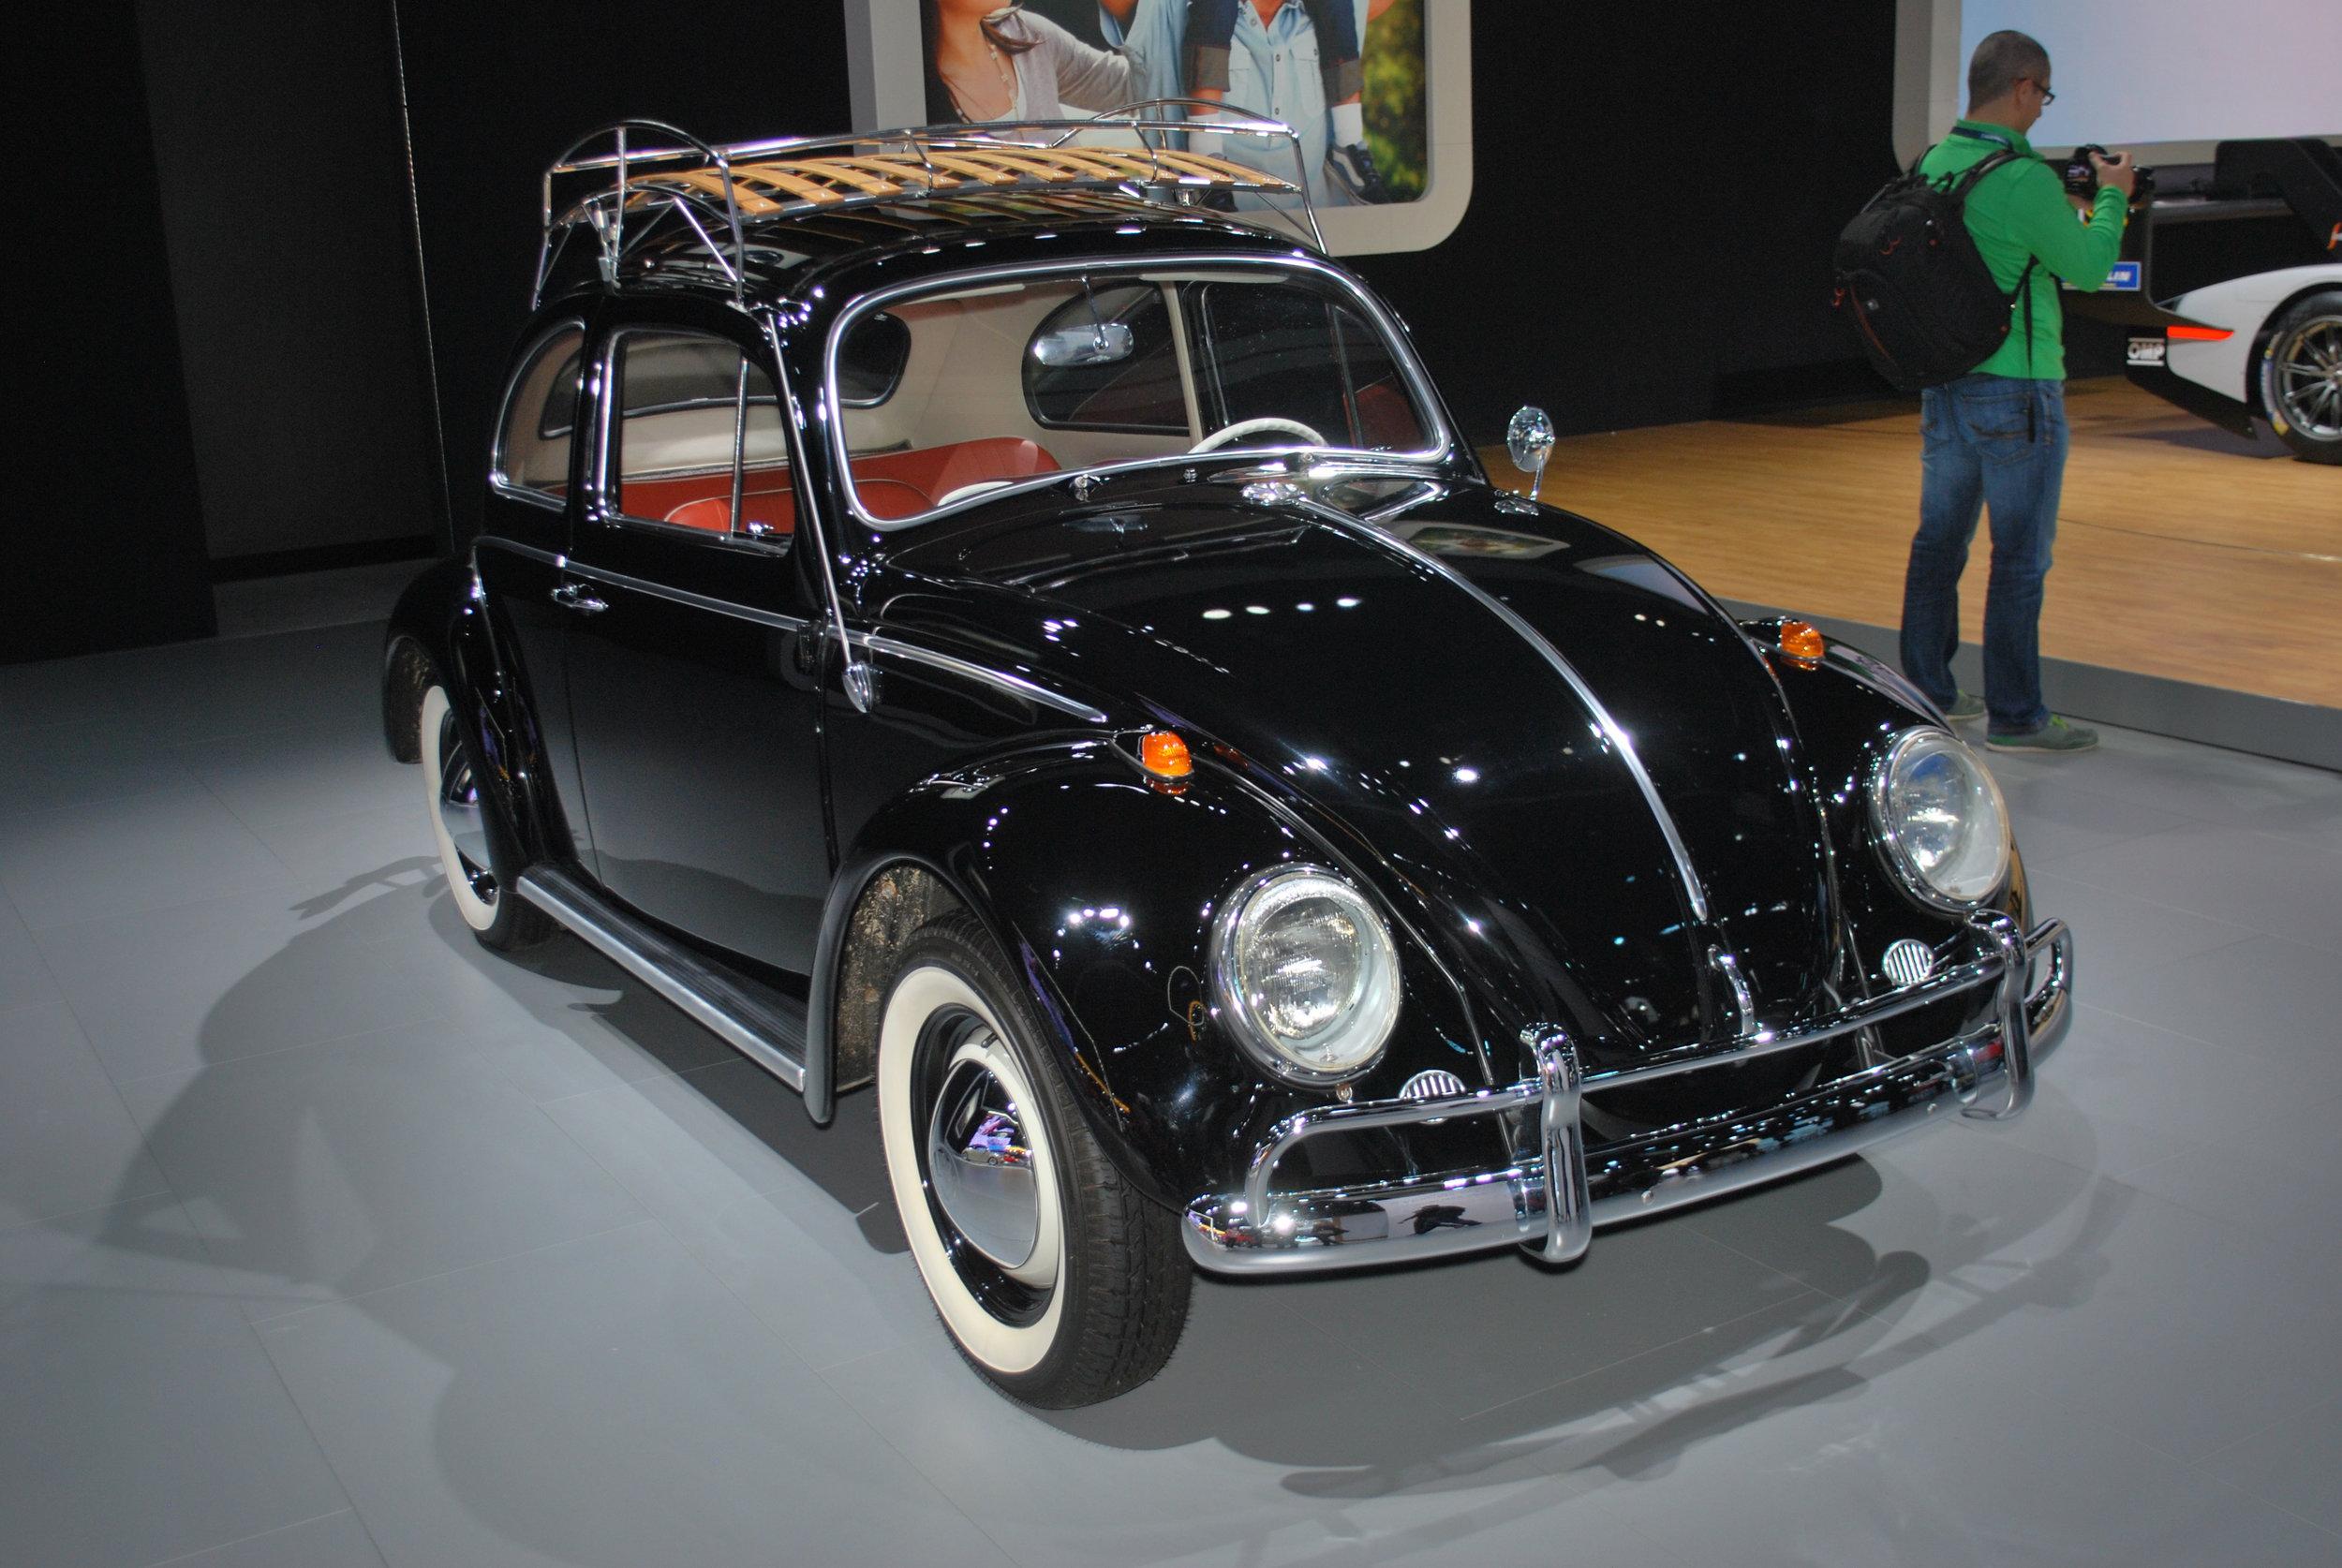 Vintage VW Beetle at the 2018 Los Angeles International Auto Sho